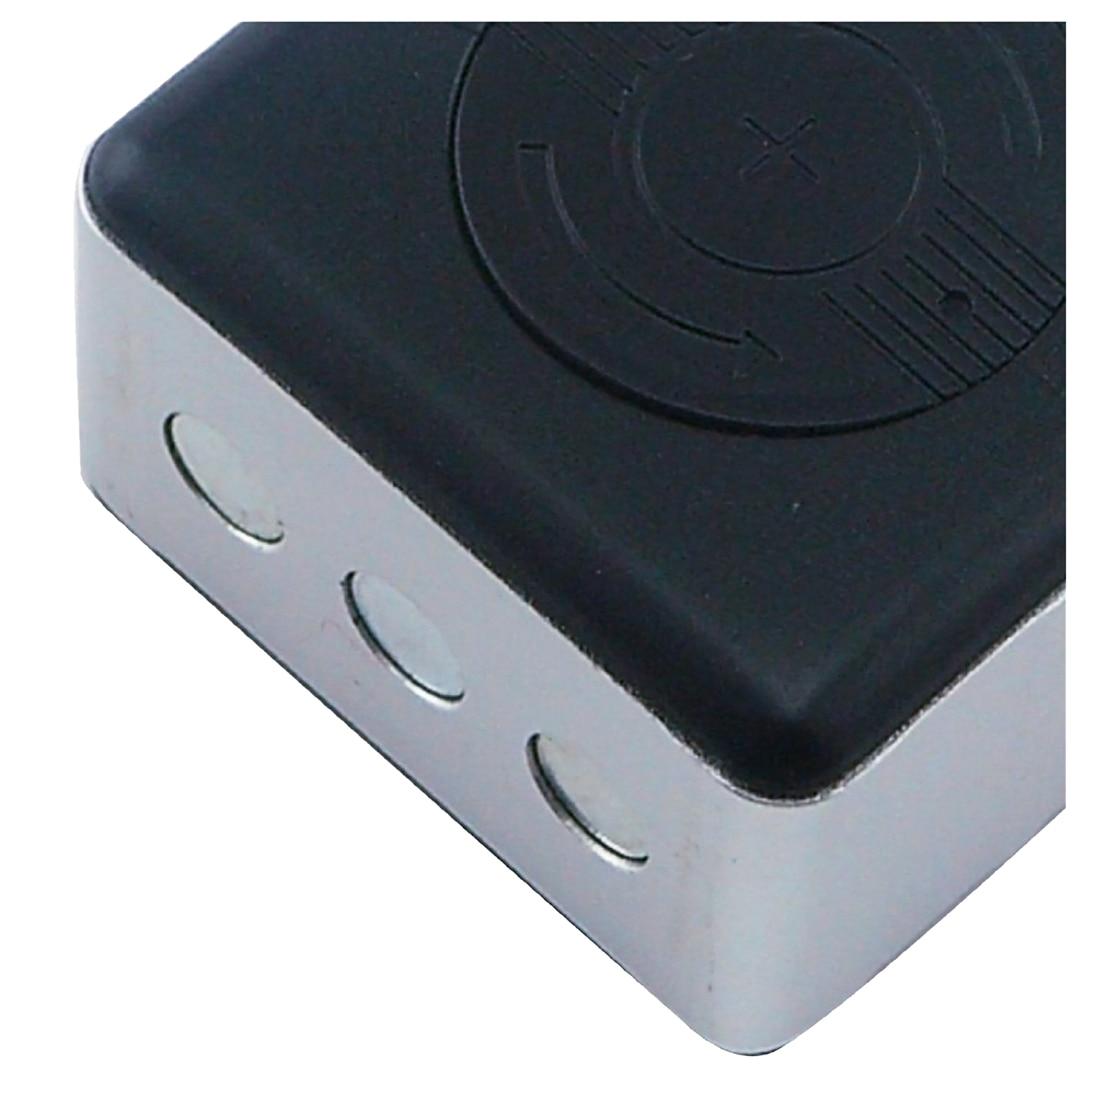 Digital Bevel Box Level Angle Finder Gauge Sensor 360 Degrees Protractor Spirit Level Inclinometer With High Precision Bubble  цены